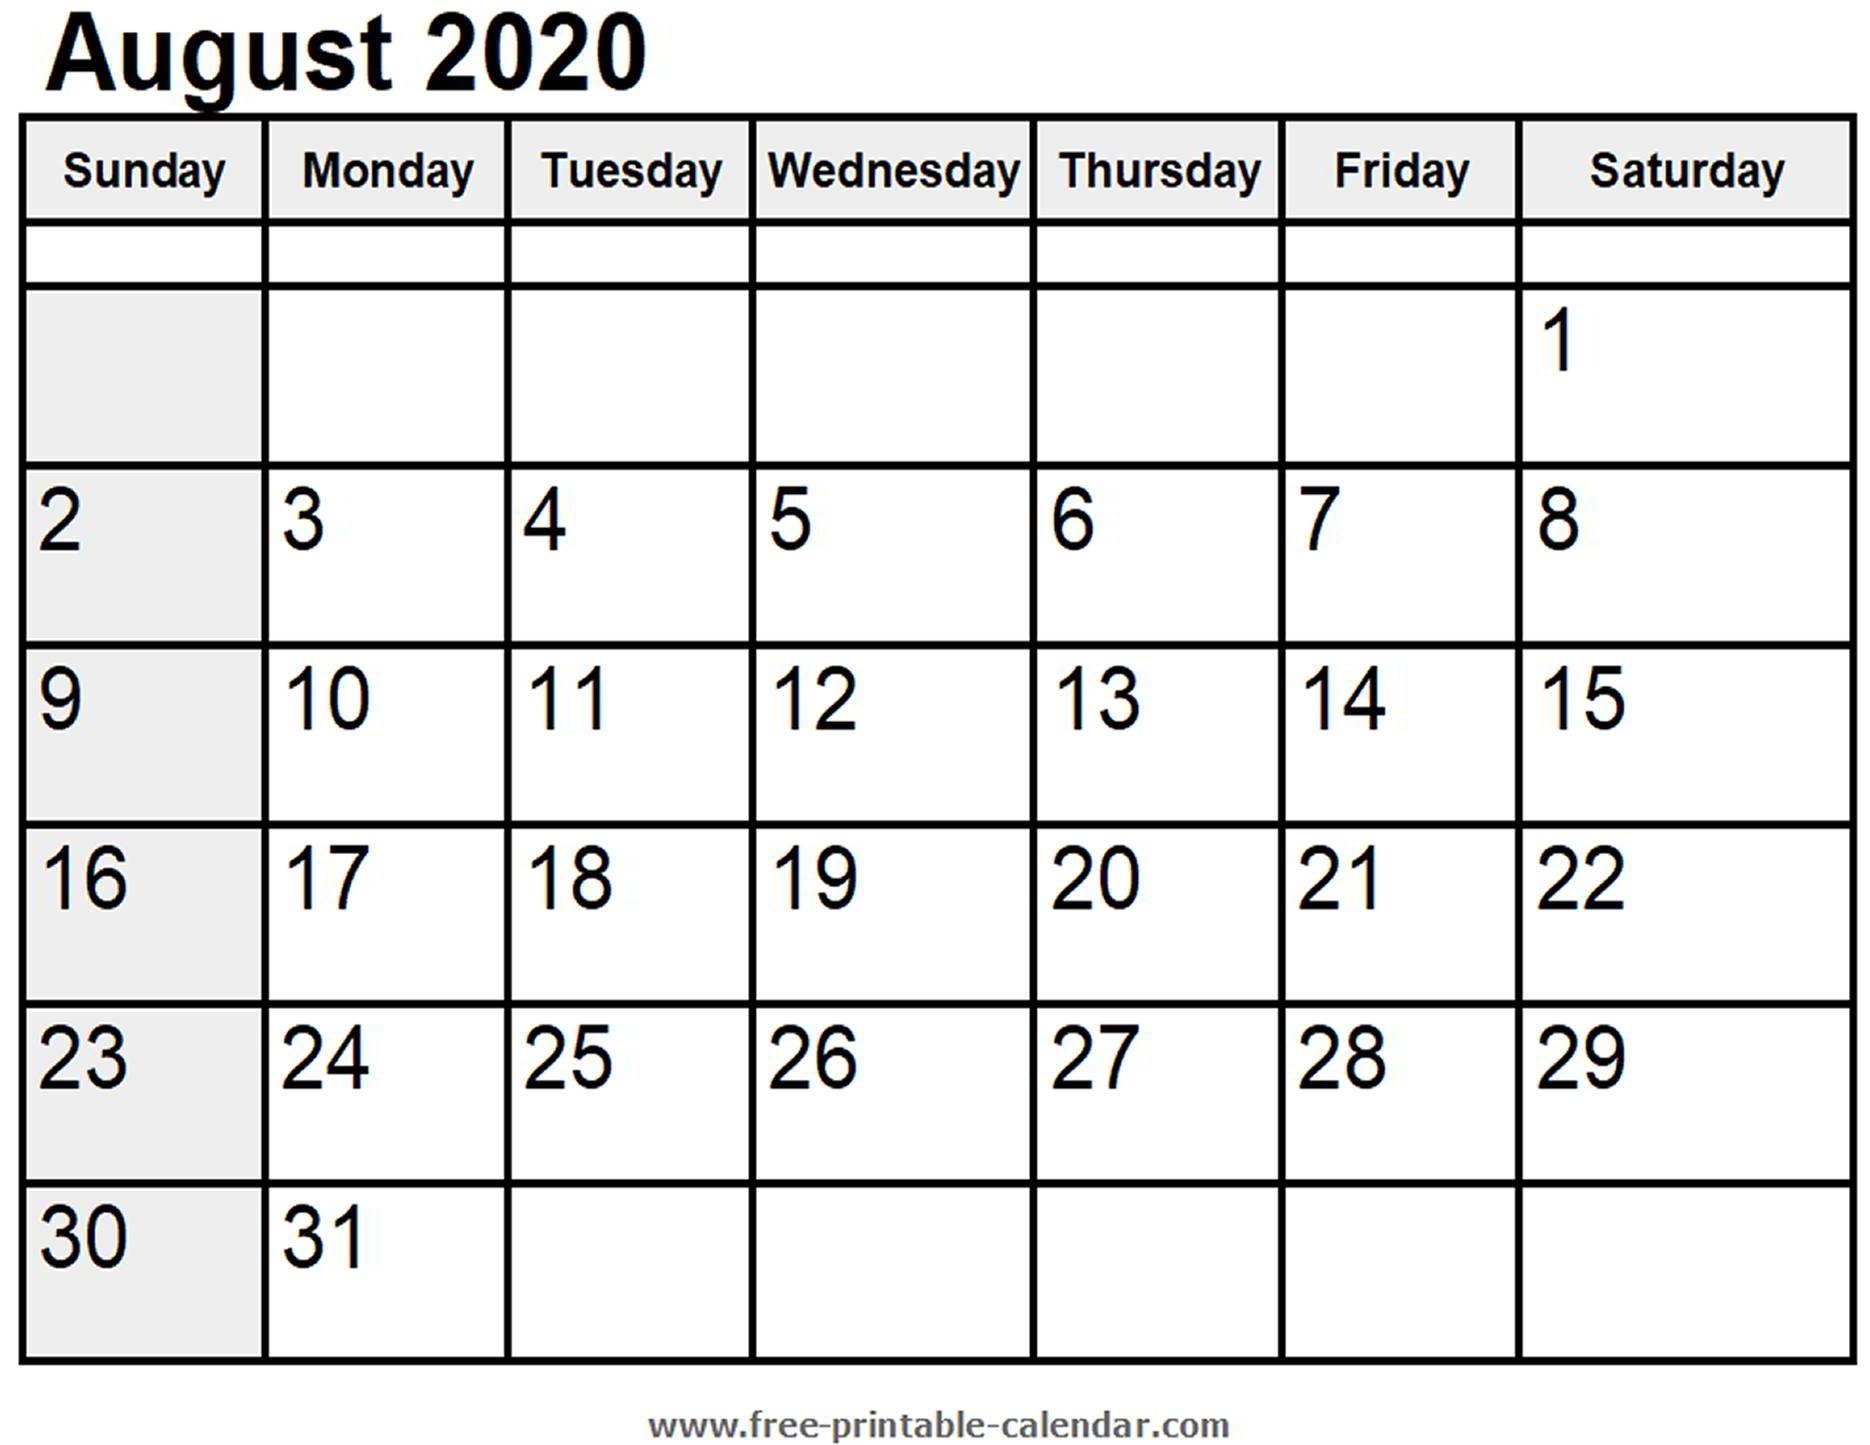 Calendar August 2020 - Free-Printable-Calendar